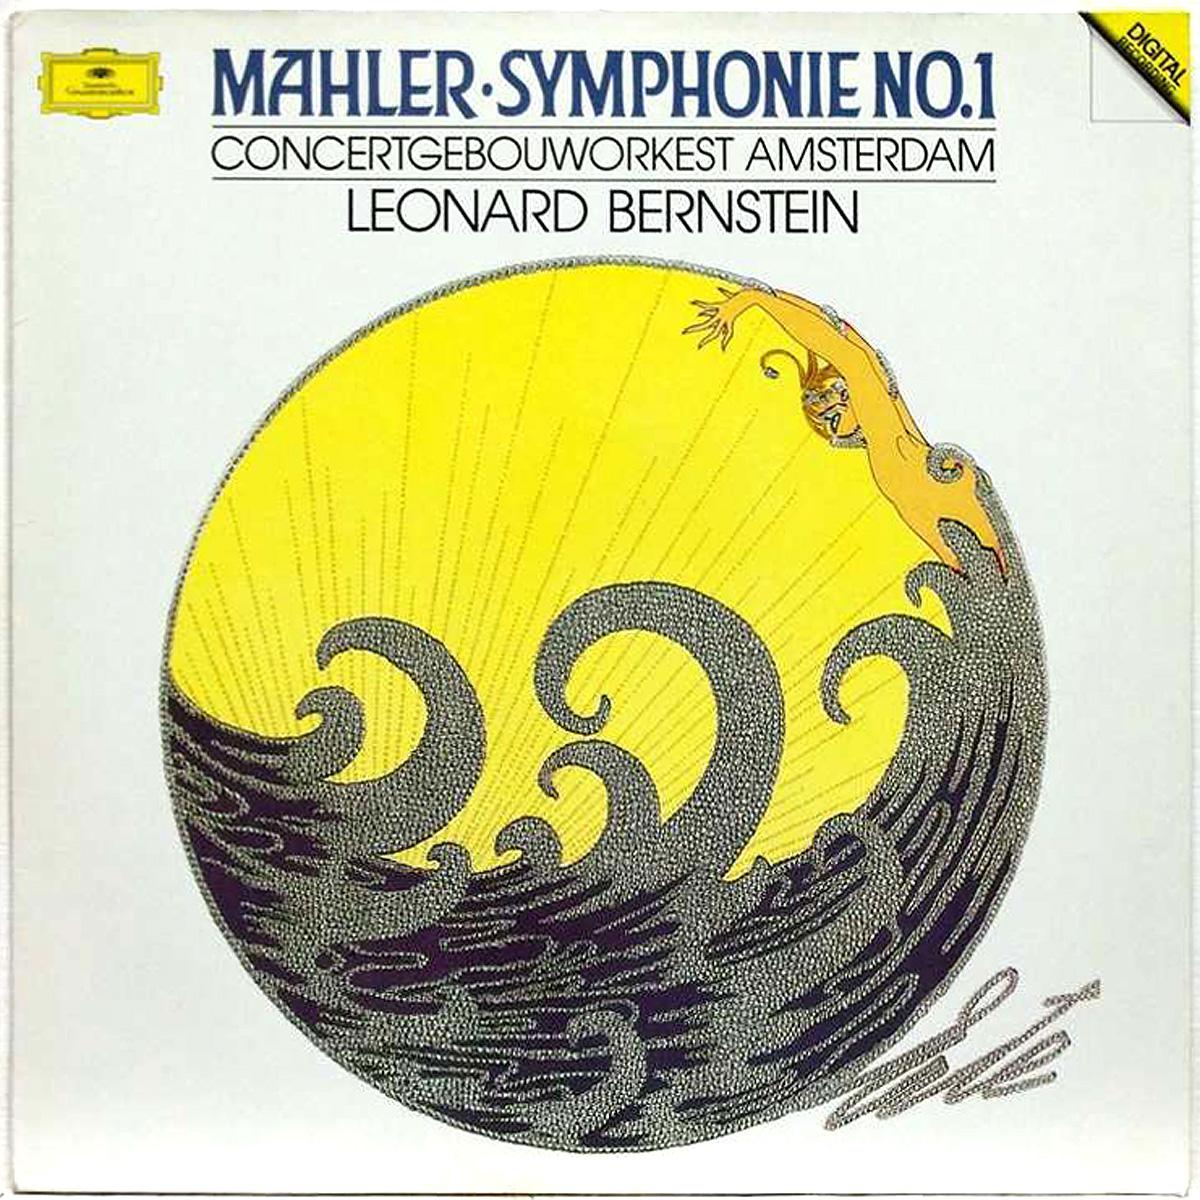 DGG 427 303 Mahler Symphonie 1 Bernstein DGG Digital Aufnahme